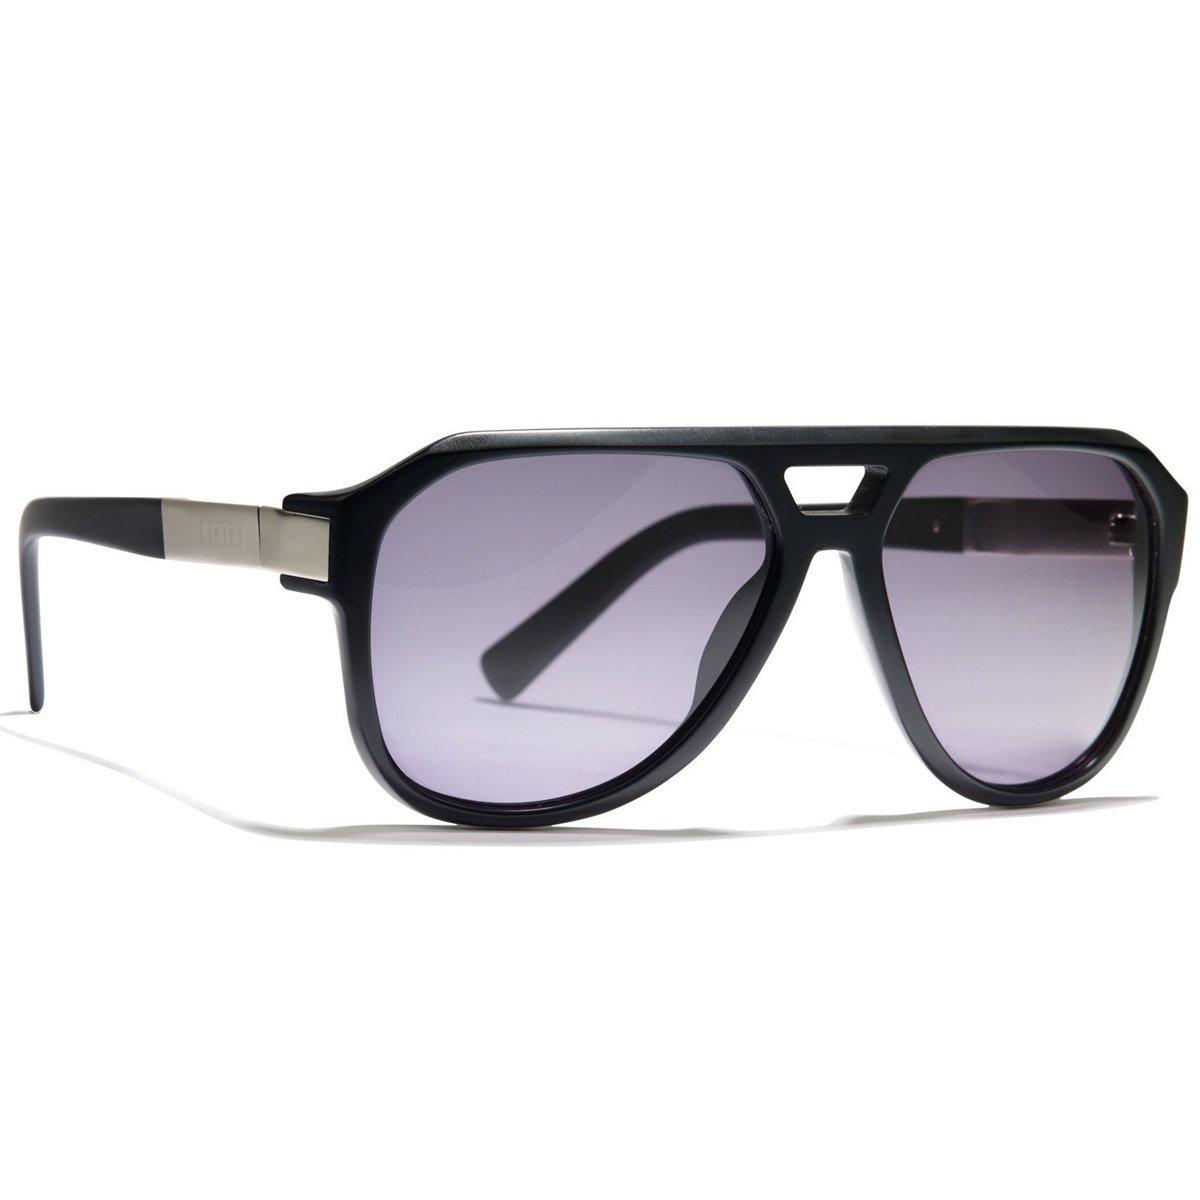 Ion - Sunglasses - Carma-schwarz